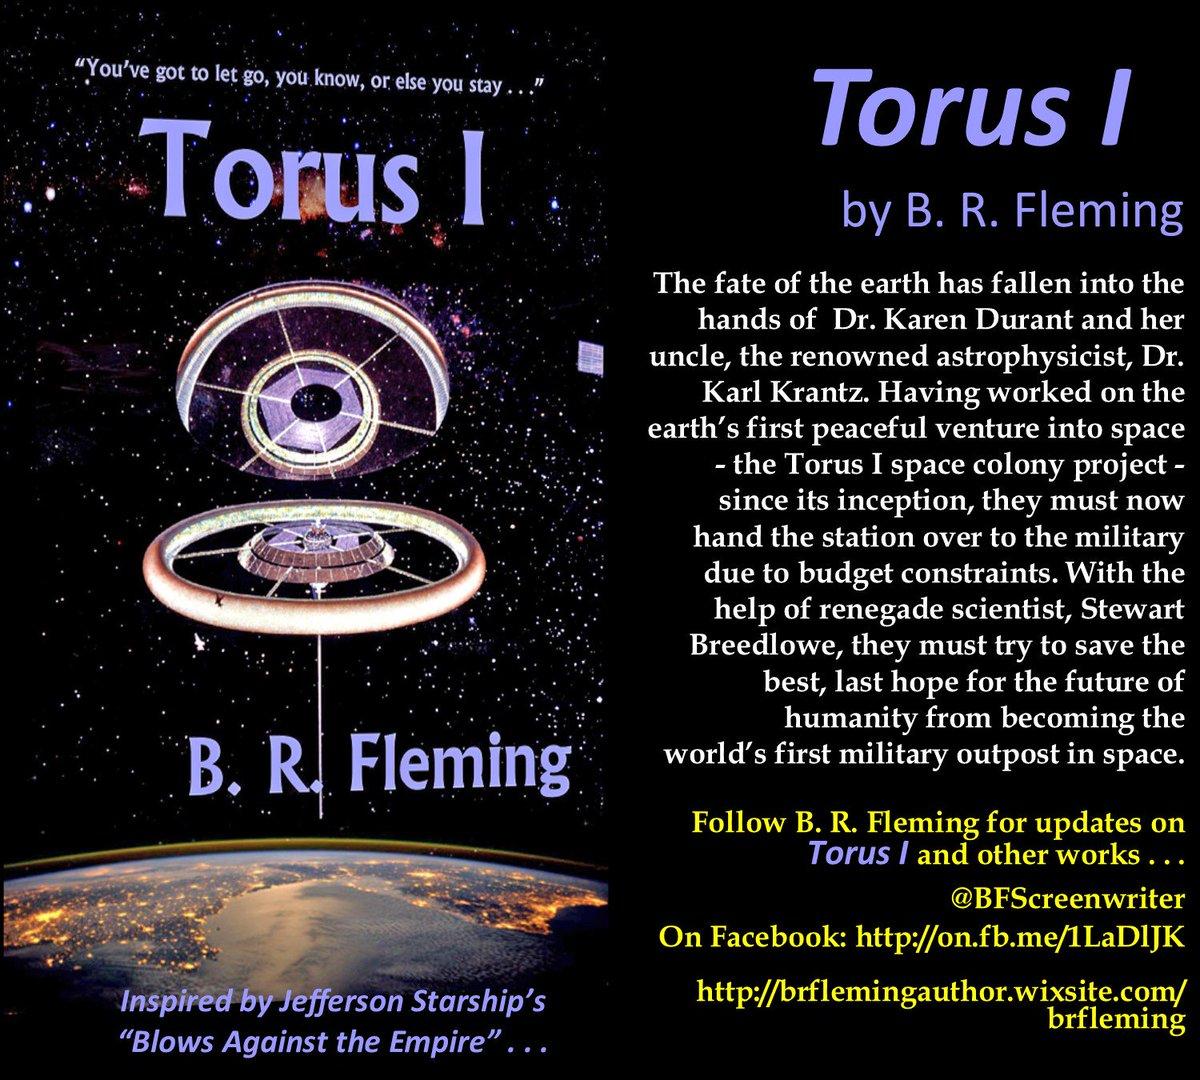 #Torus_IWill mankind survive? #amwritingscifi #scifi @BuzzFeed @RGBookWorld @Pizzazz_Books @CircleofBooks @AlmondPress @ReadersGazette #WW<br>http://pic.twitter.com/hG23iQnXvJ